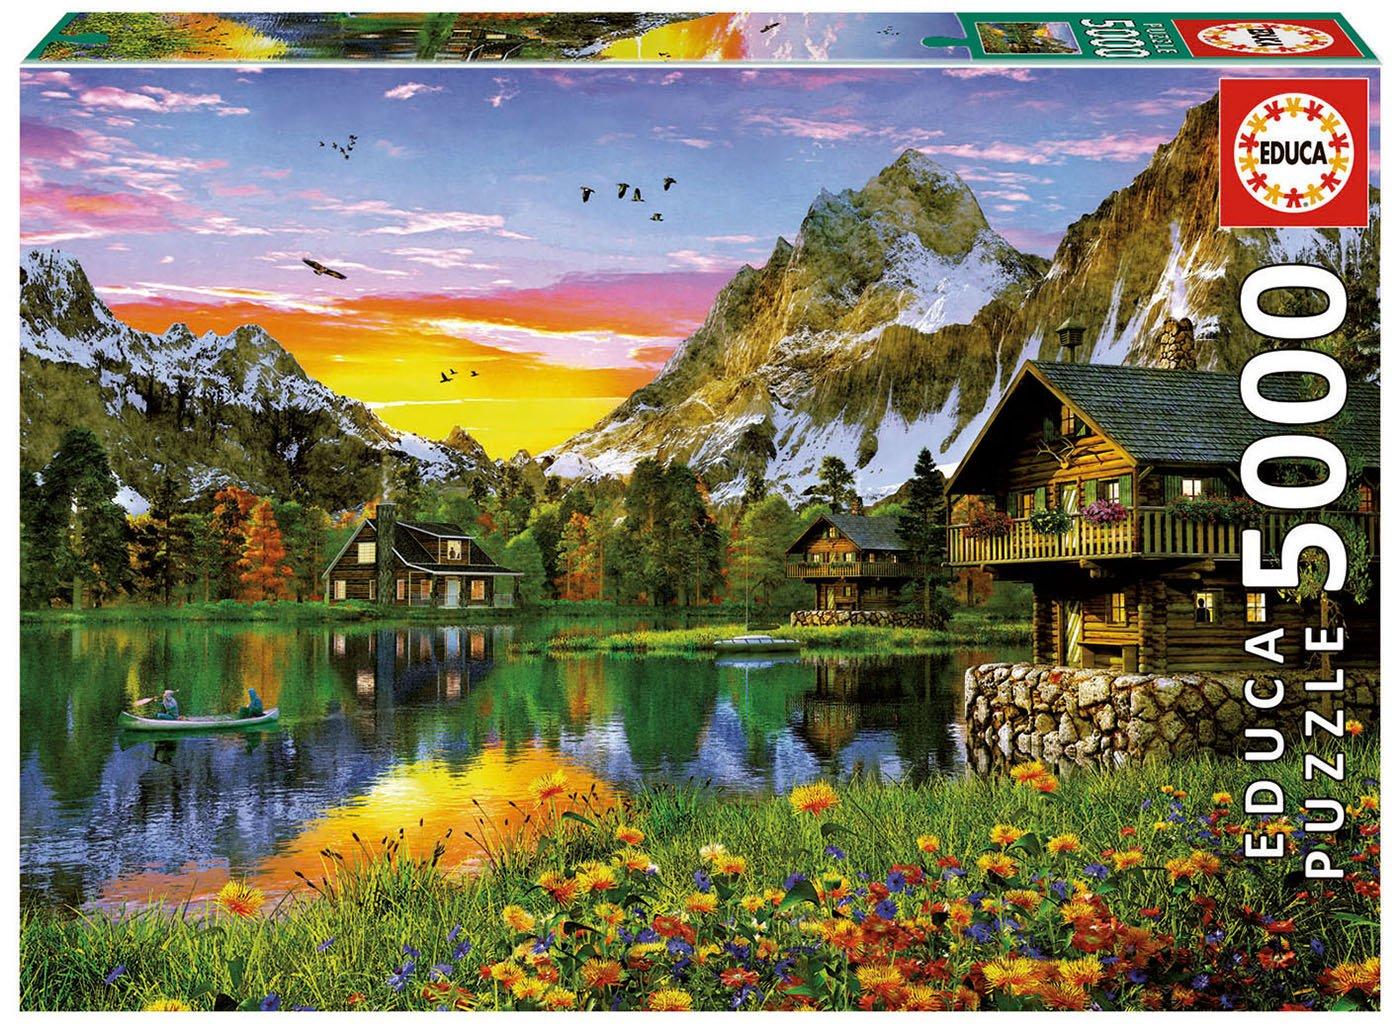 Educa Alpine Lake Lake B07935J4NK Alpine B07935J4NK, サプライズ激熱店:62820e38 --- ero-shop-kupidon.ru